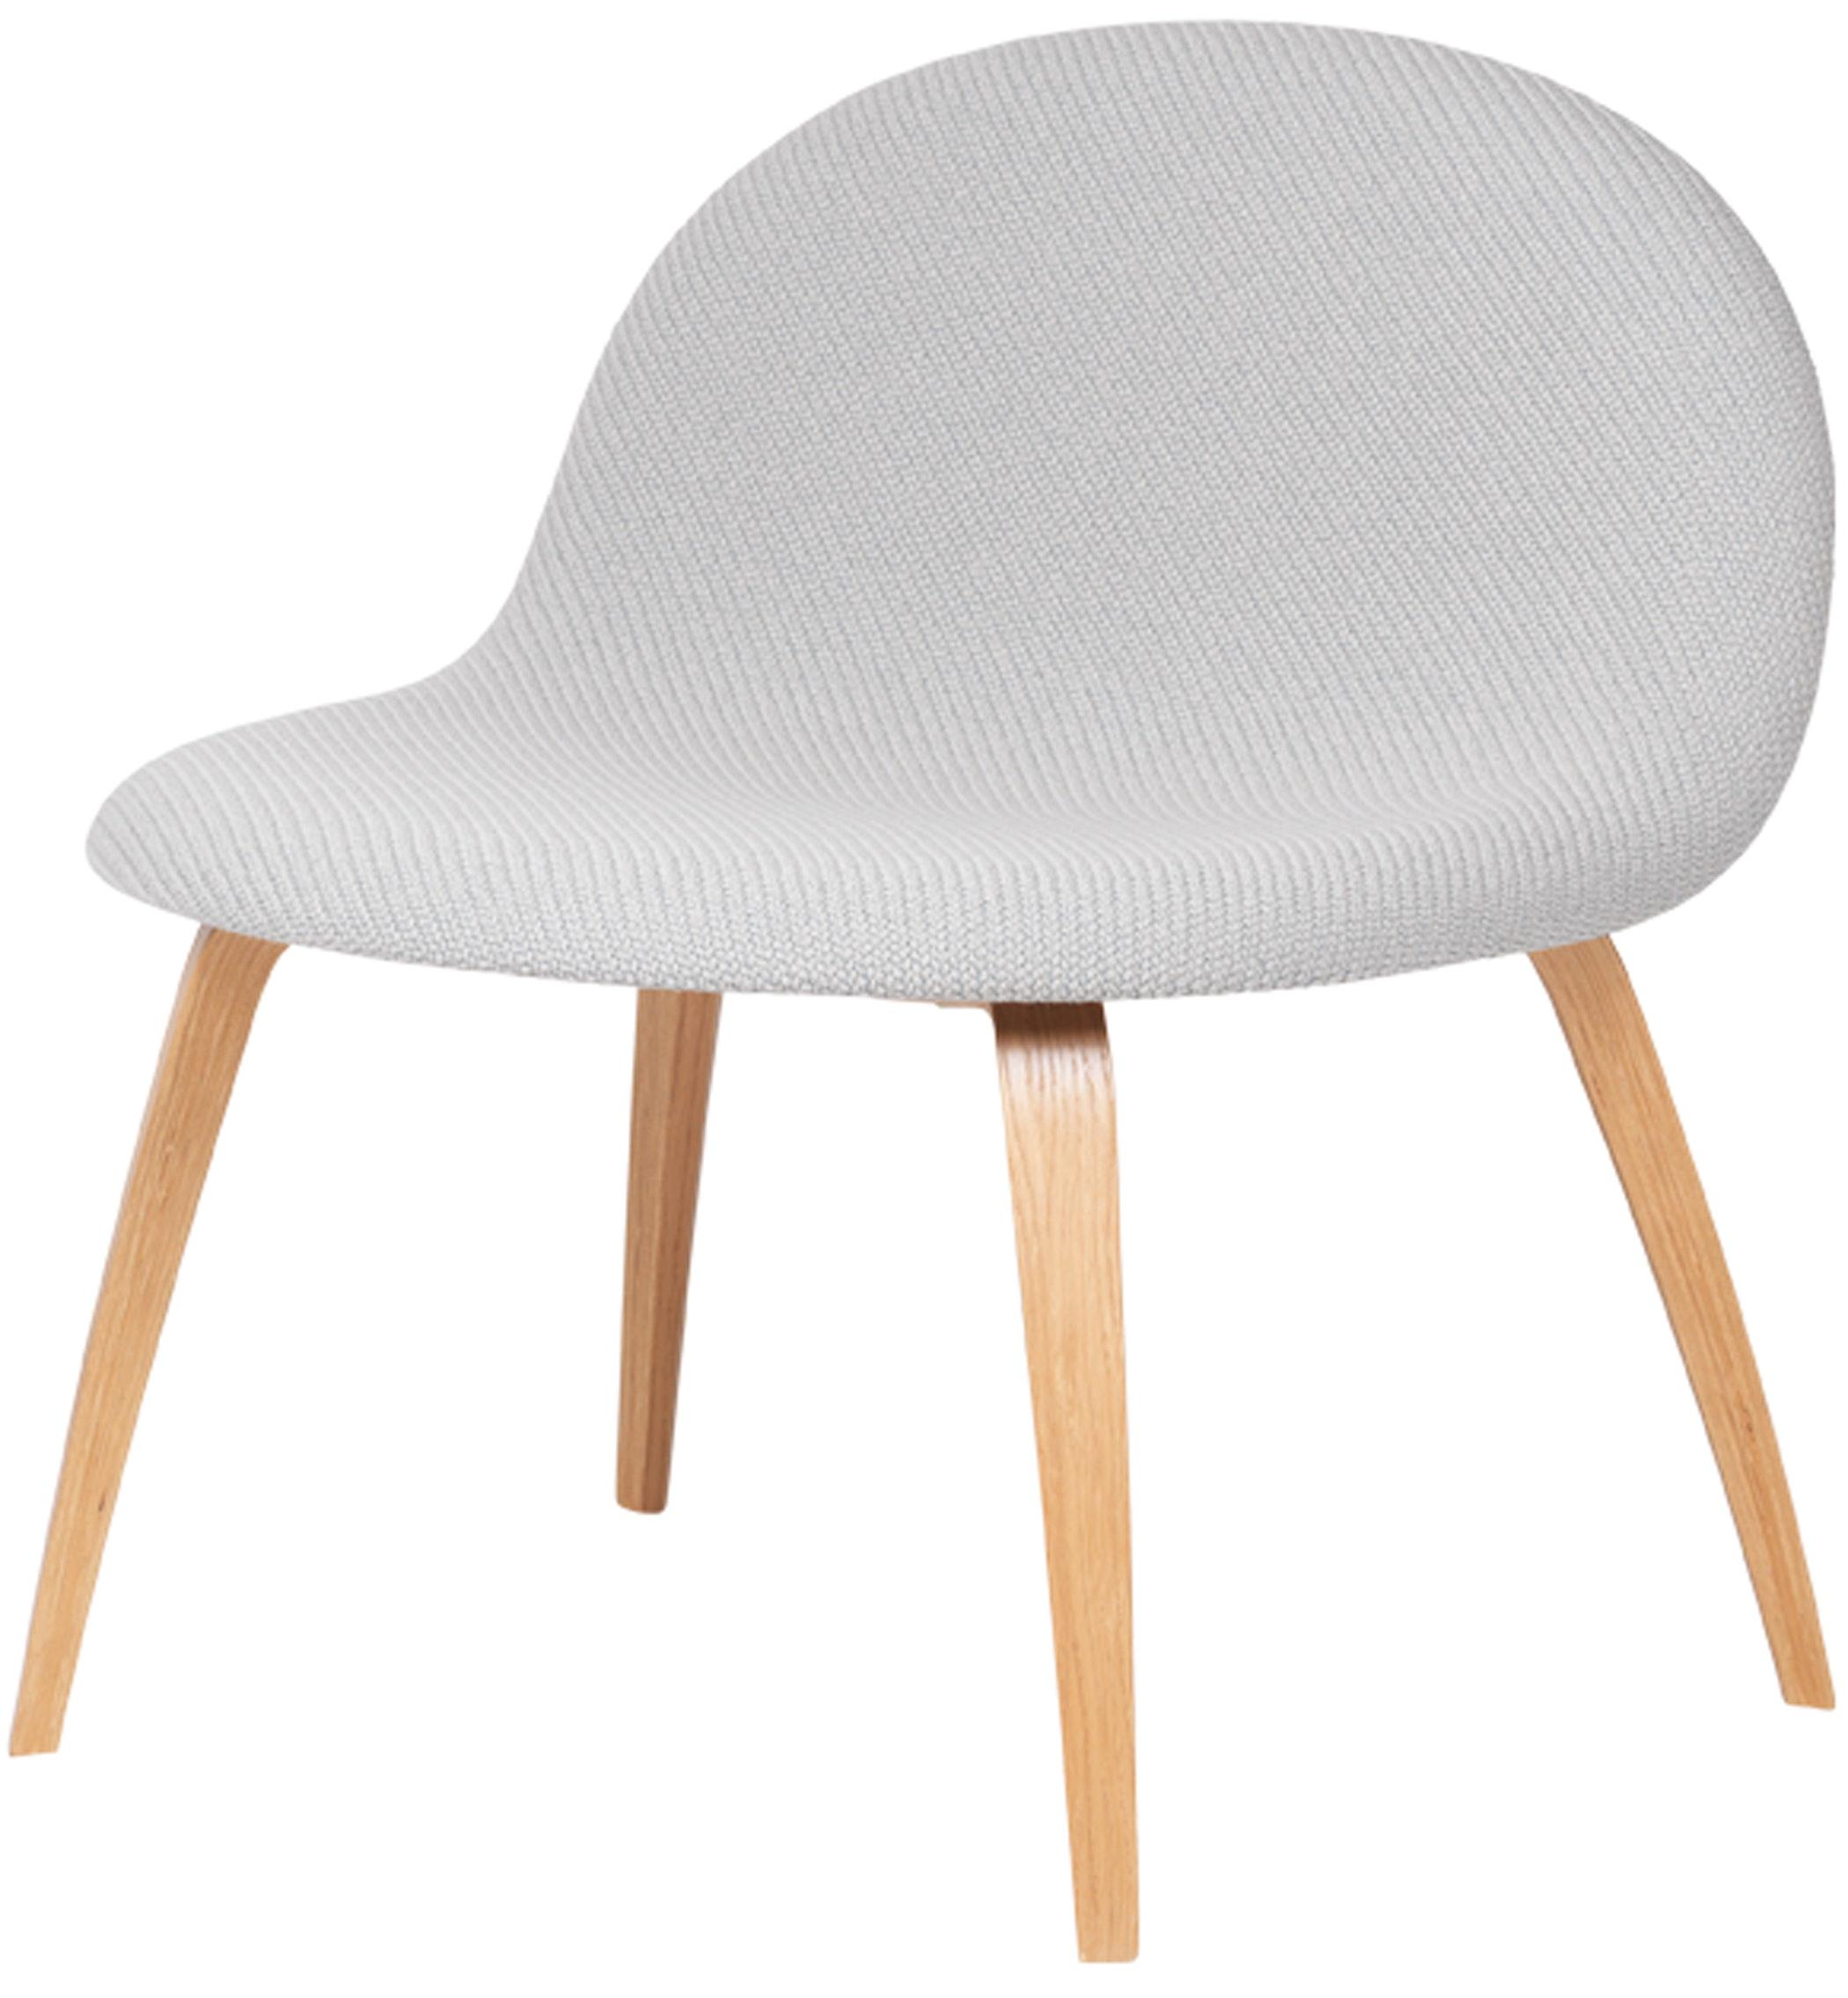 Lounge Tr Stel Hvid Front Product72Dpi